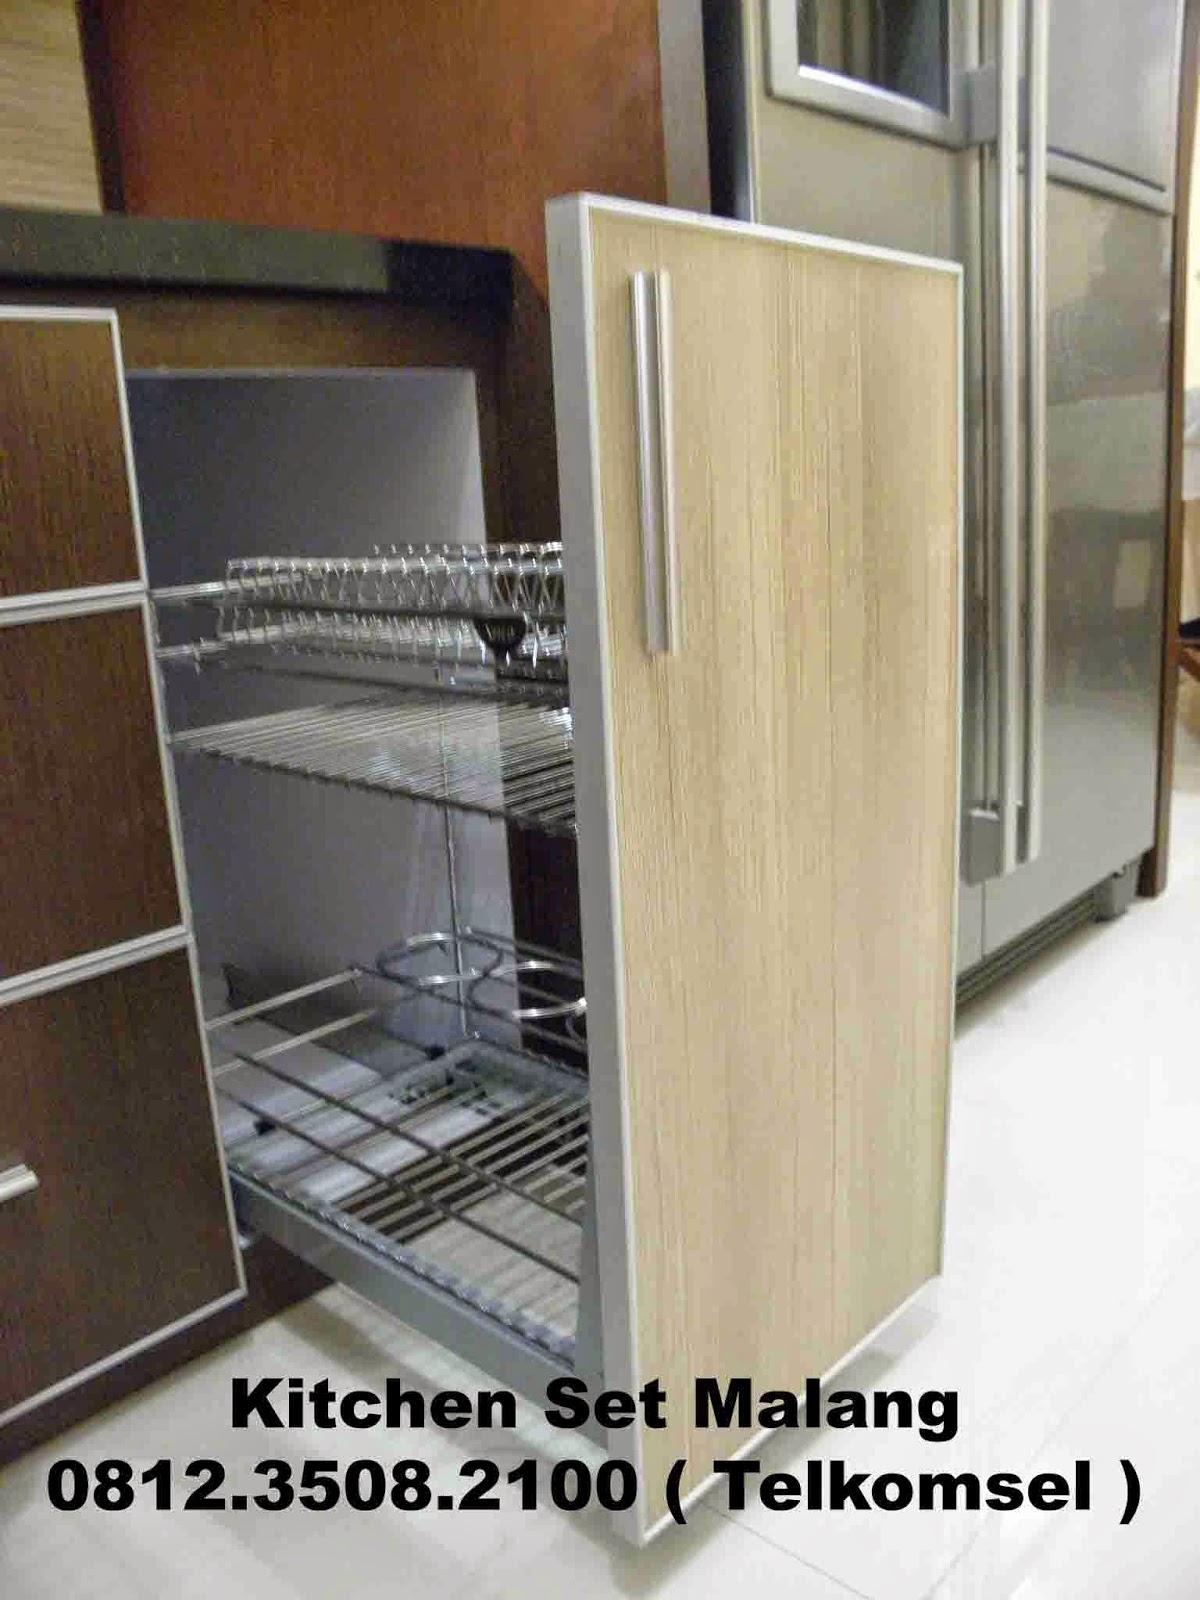 Kitchen Set Malang Murah Kitchen Set Di Malang Jasa Kitchen Set